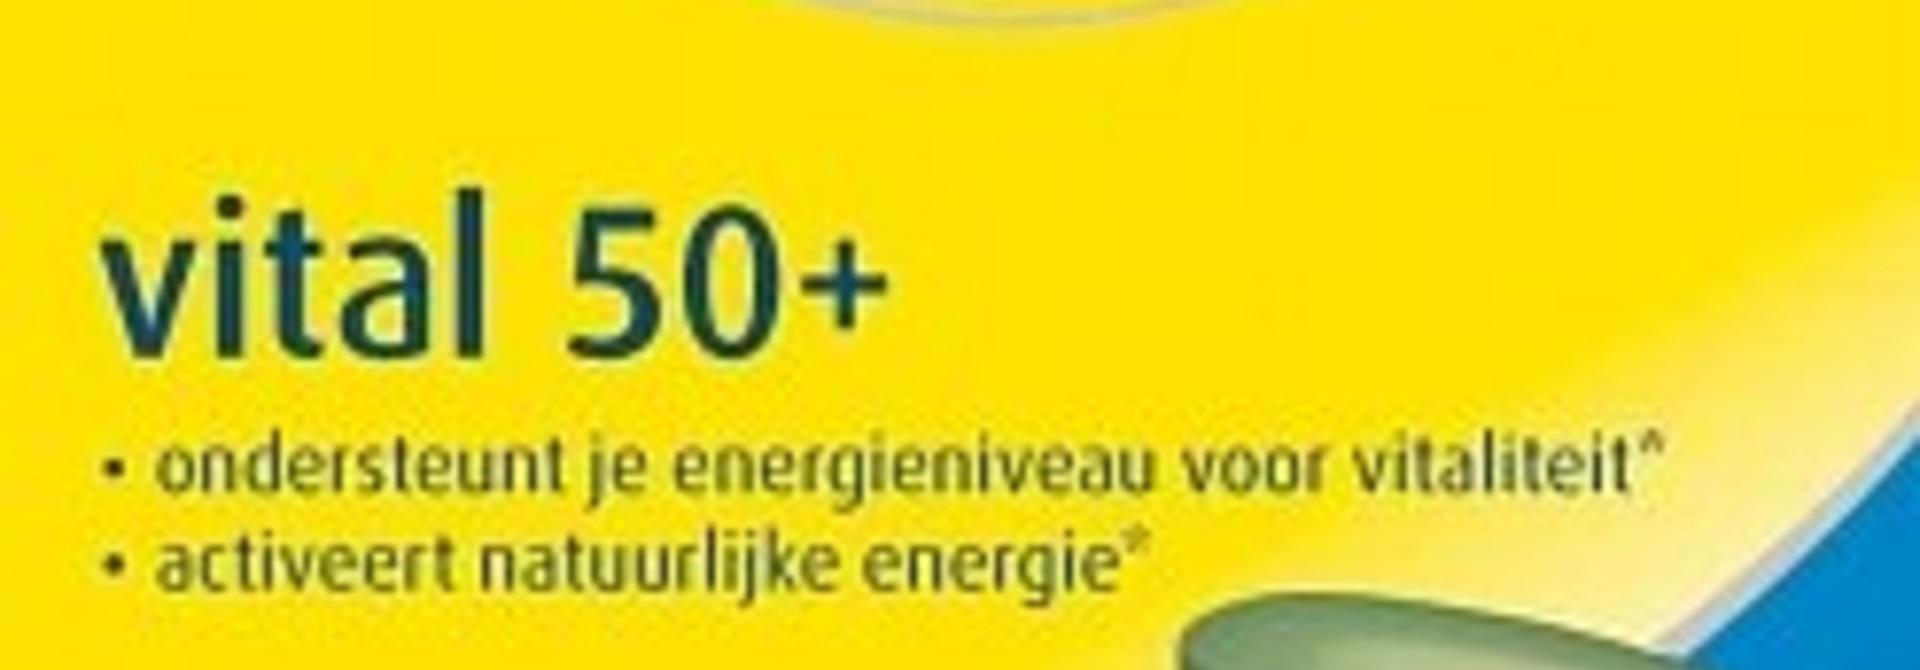 Supradyn Vital 50+ 35 tabletten